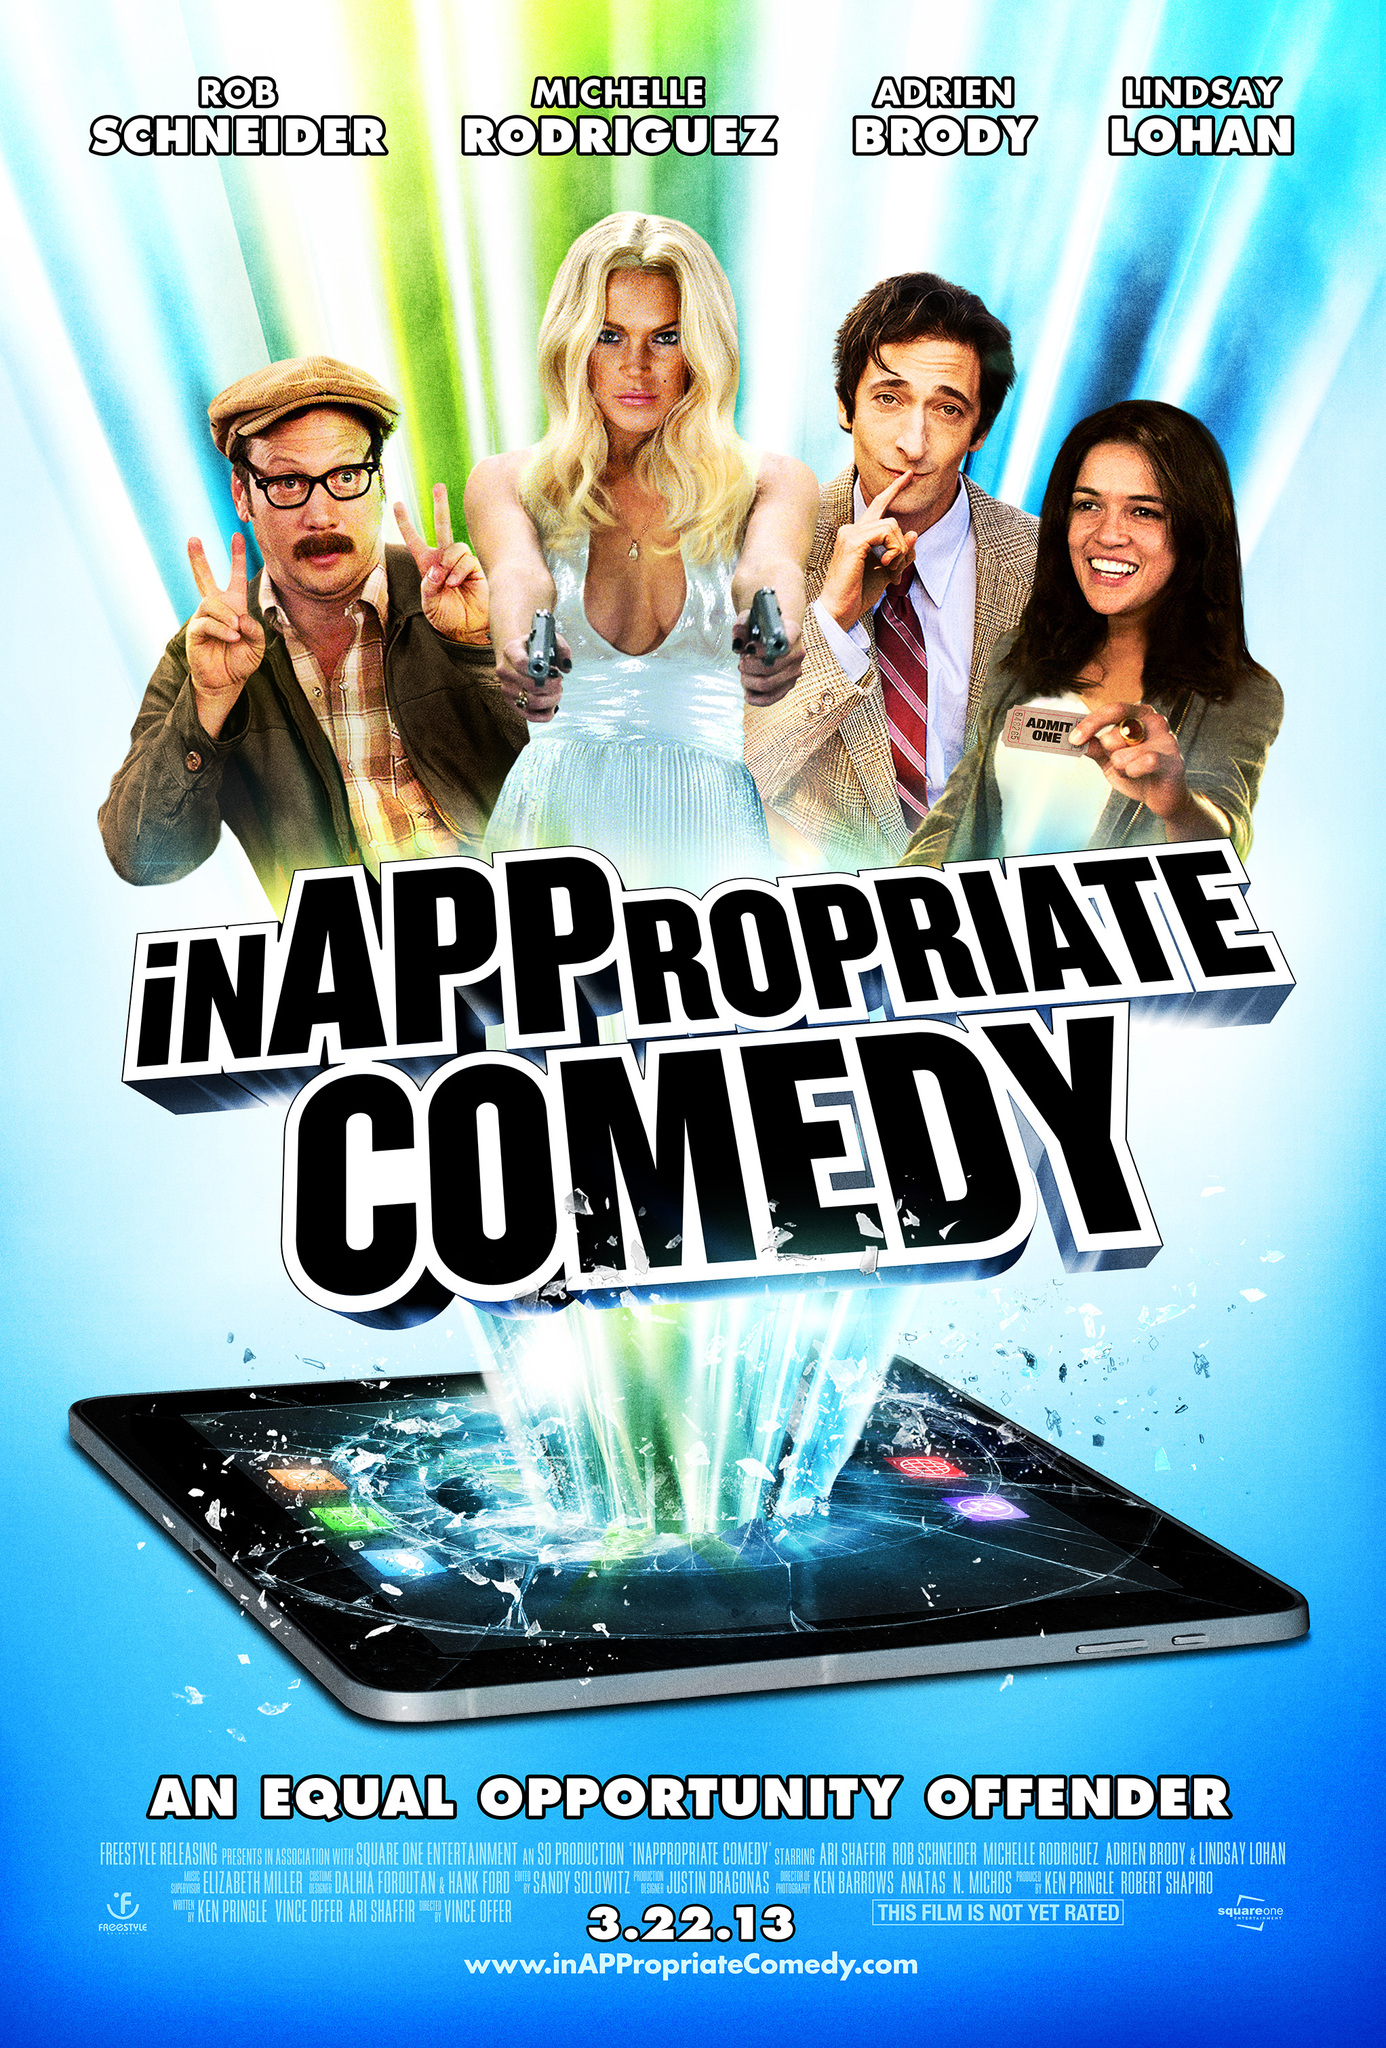 Congratulate, inappropriate comedy lindsay lohan nude exact